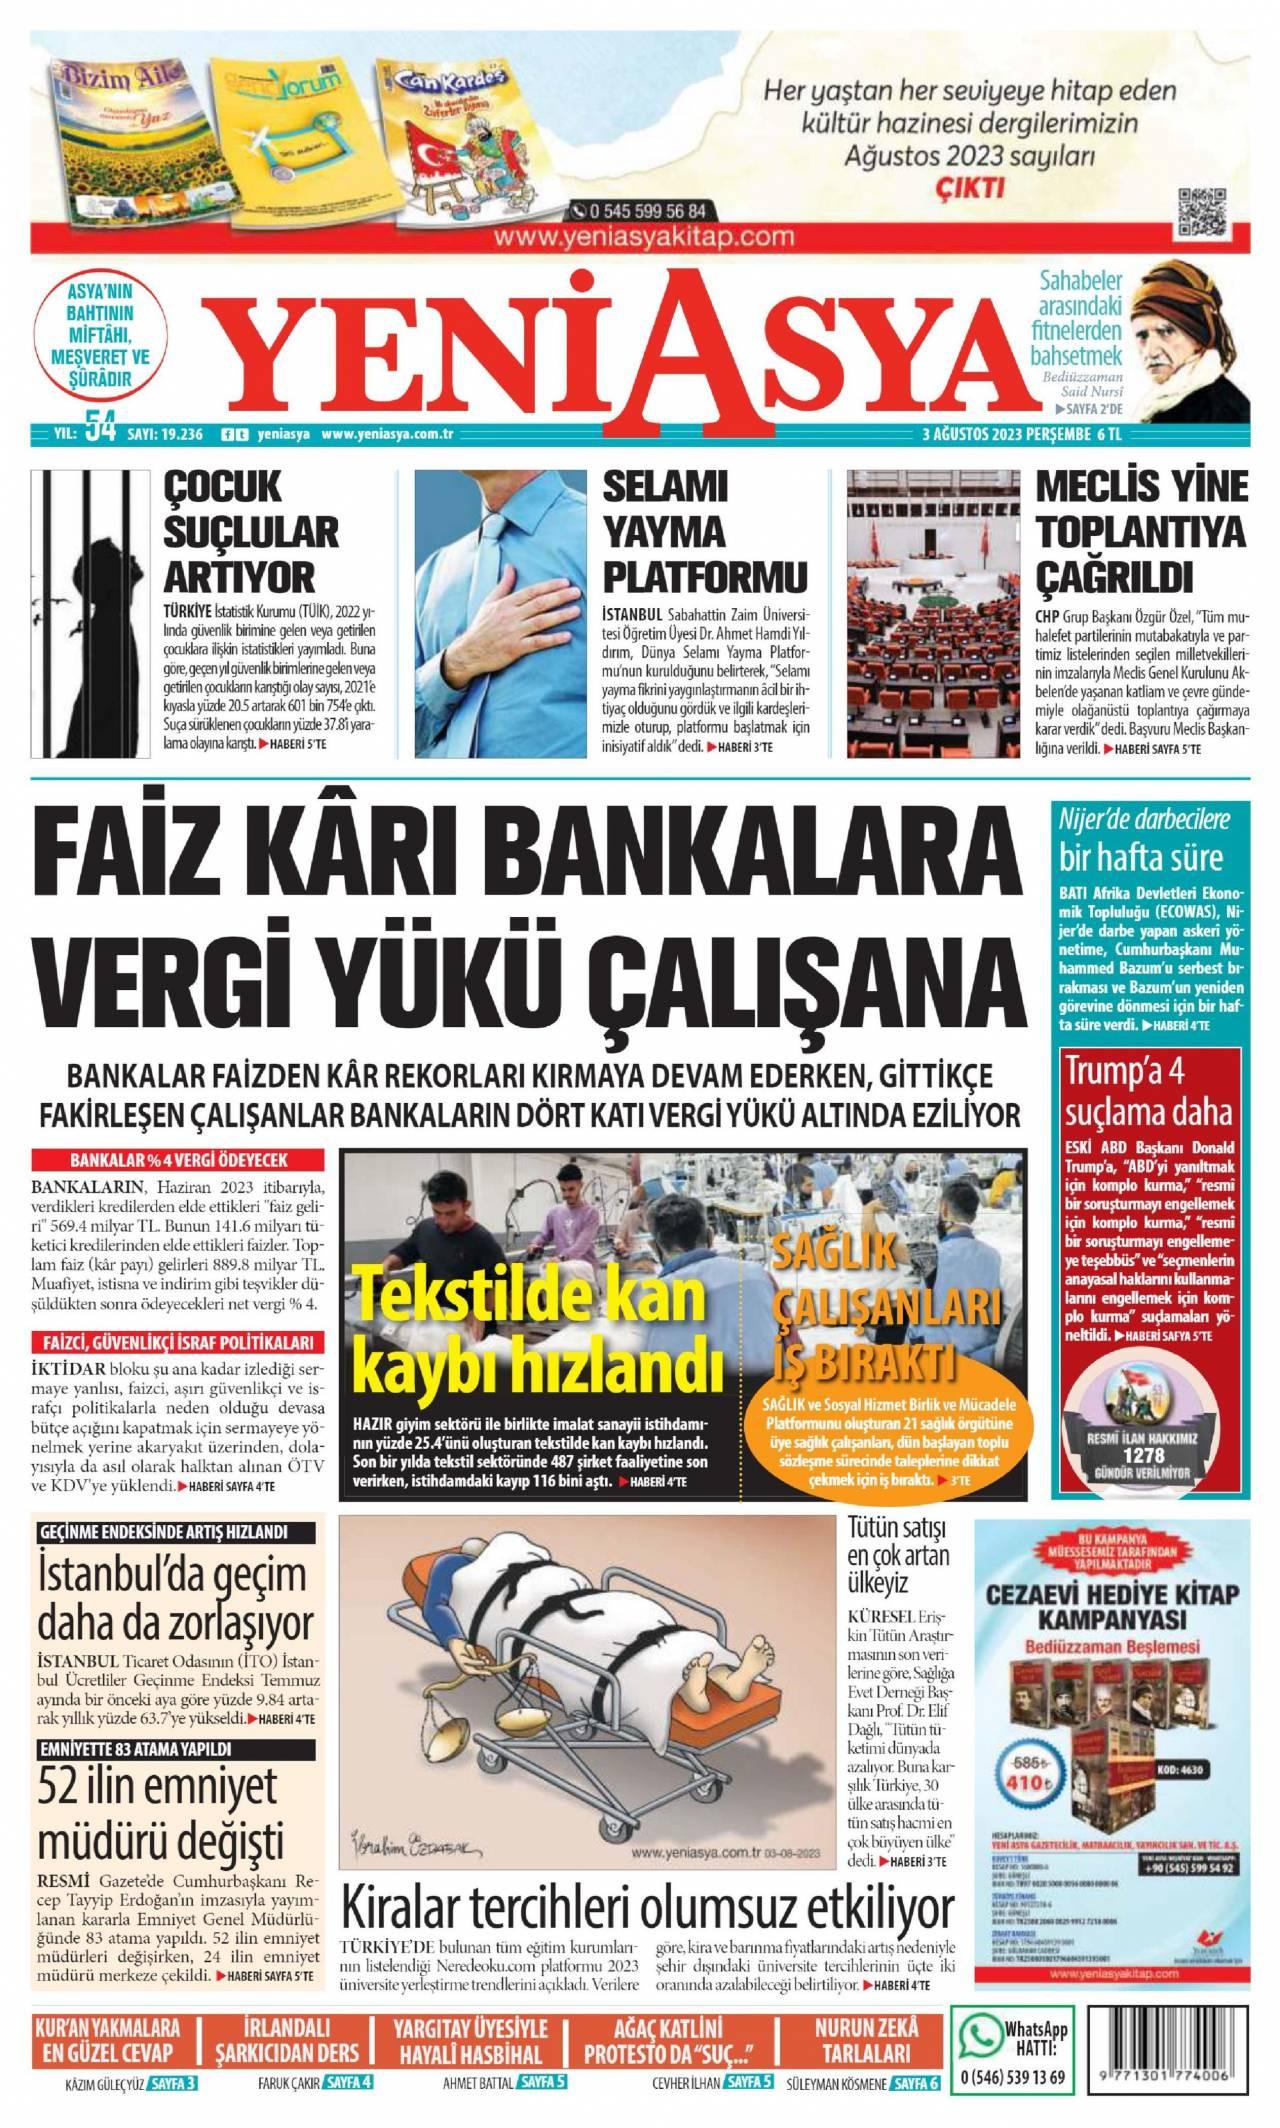 4 Haziran 2020, Perşembe yeniasya Gazetesi